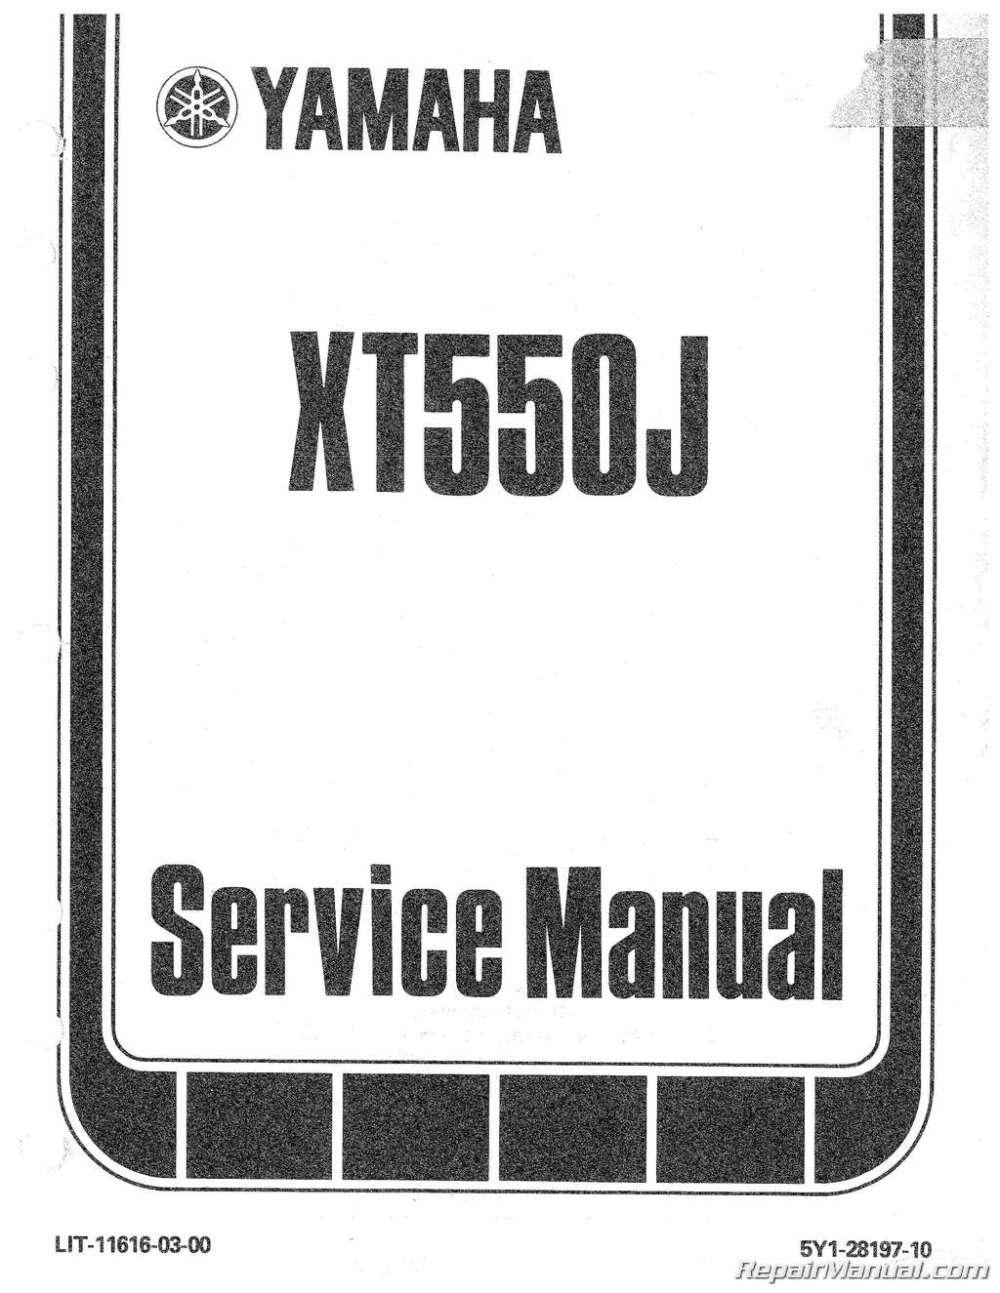 medium resolution of 1982 yamaha xt550 motorcycle service repair maintenance manual 1984 yamaha xt 600 yamaha xt 550 wiring diagram